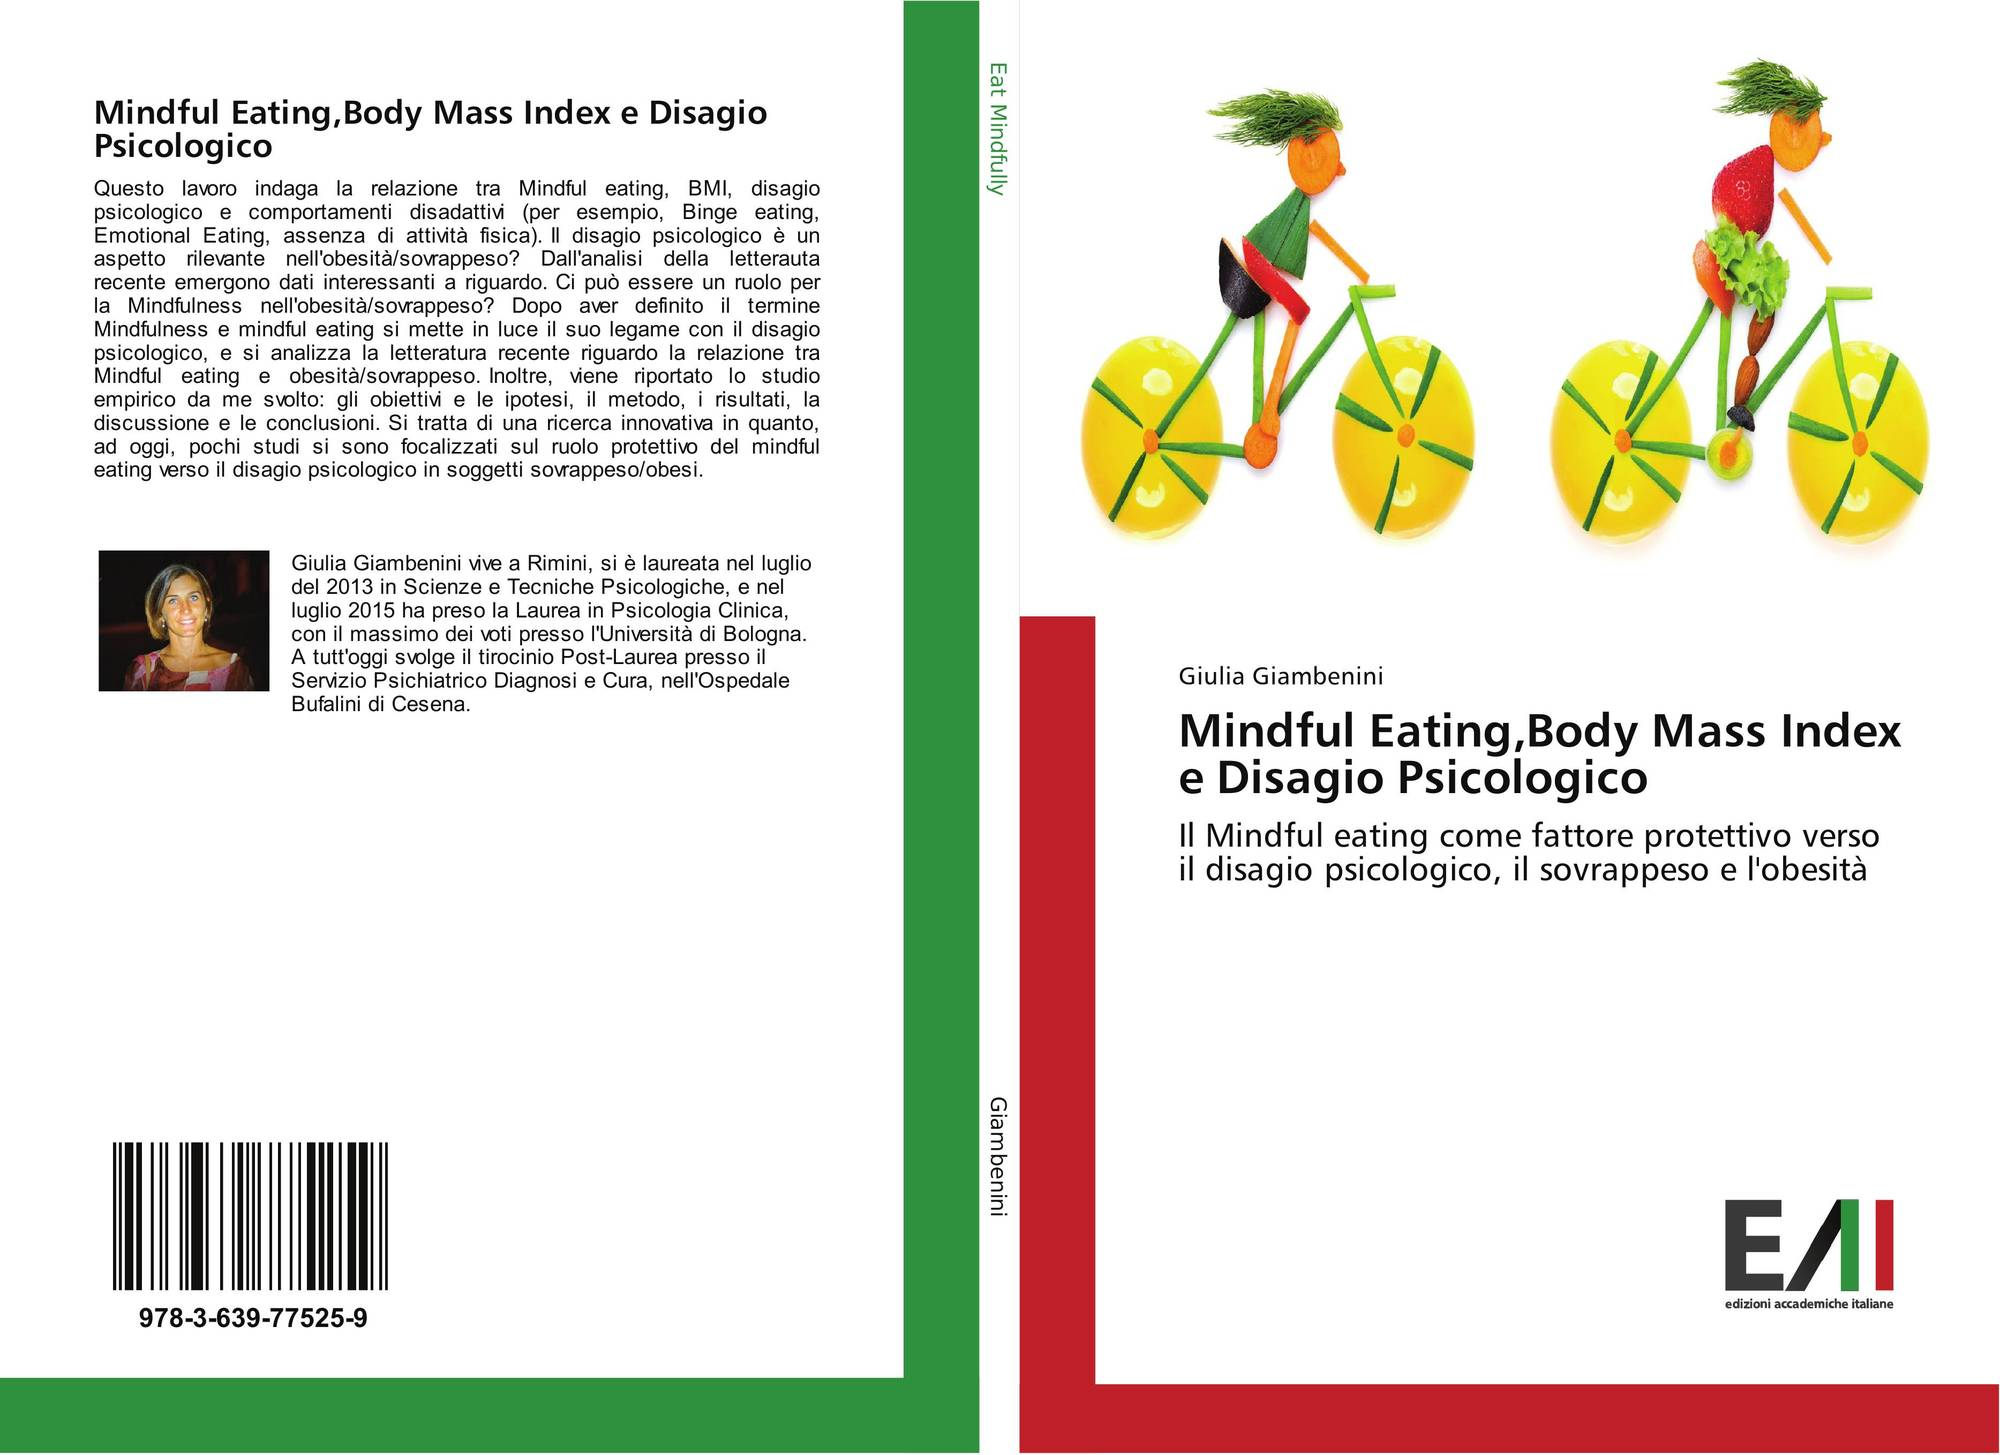 Mindful eating body mass index e disagio psicologico 978 3 639 77525